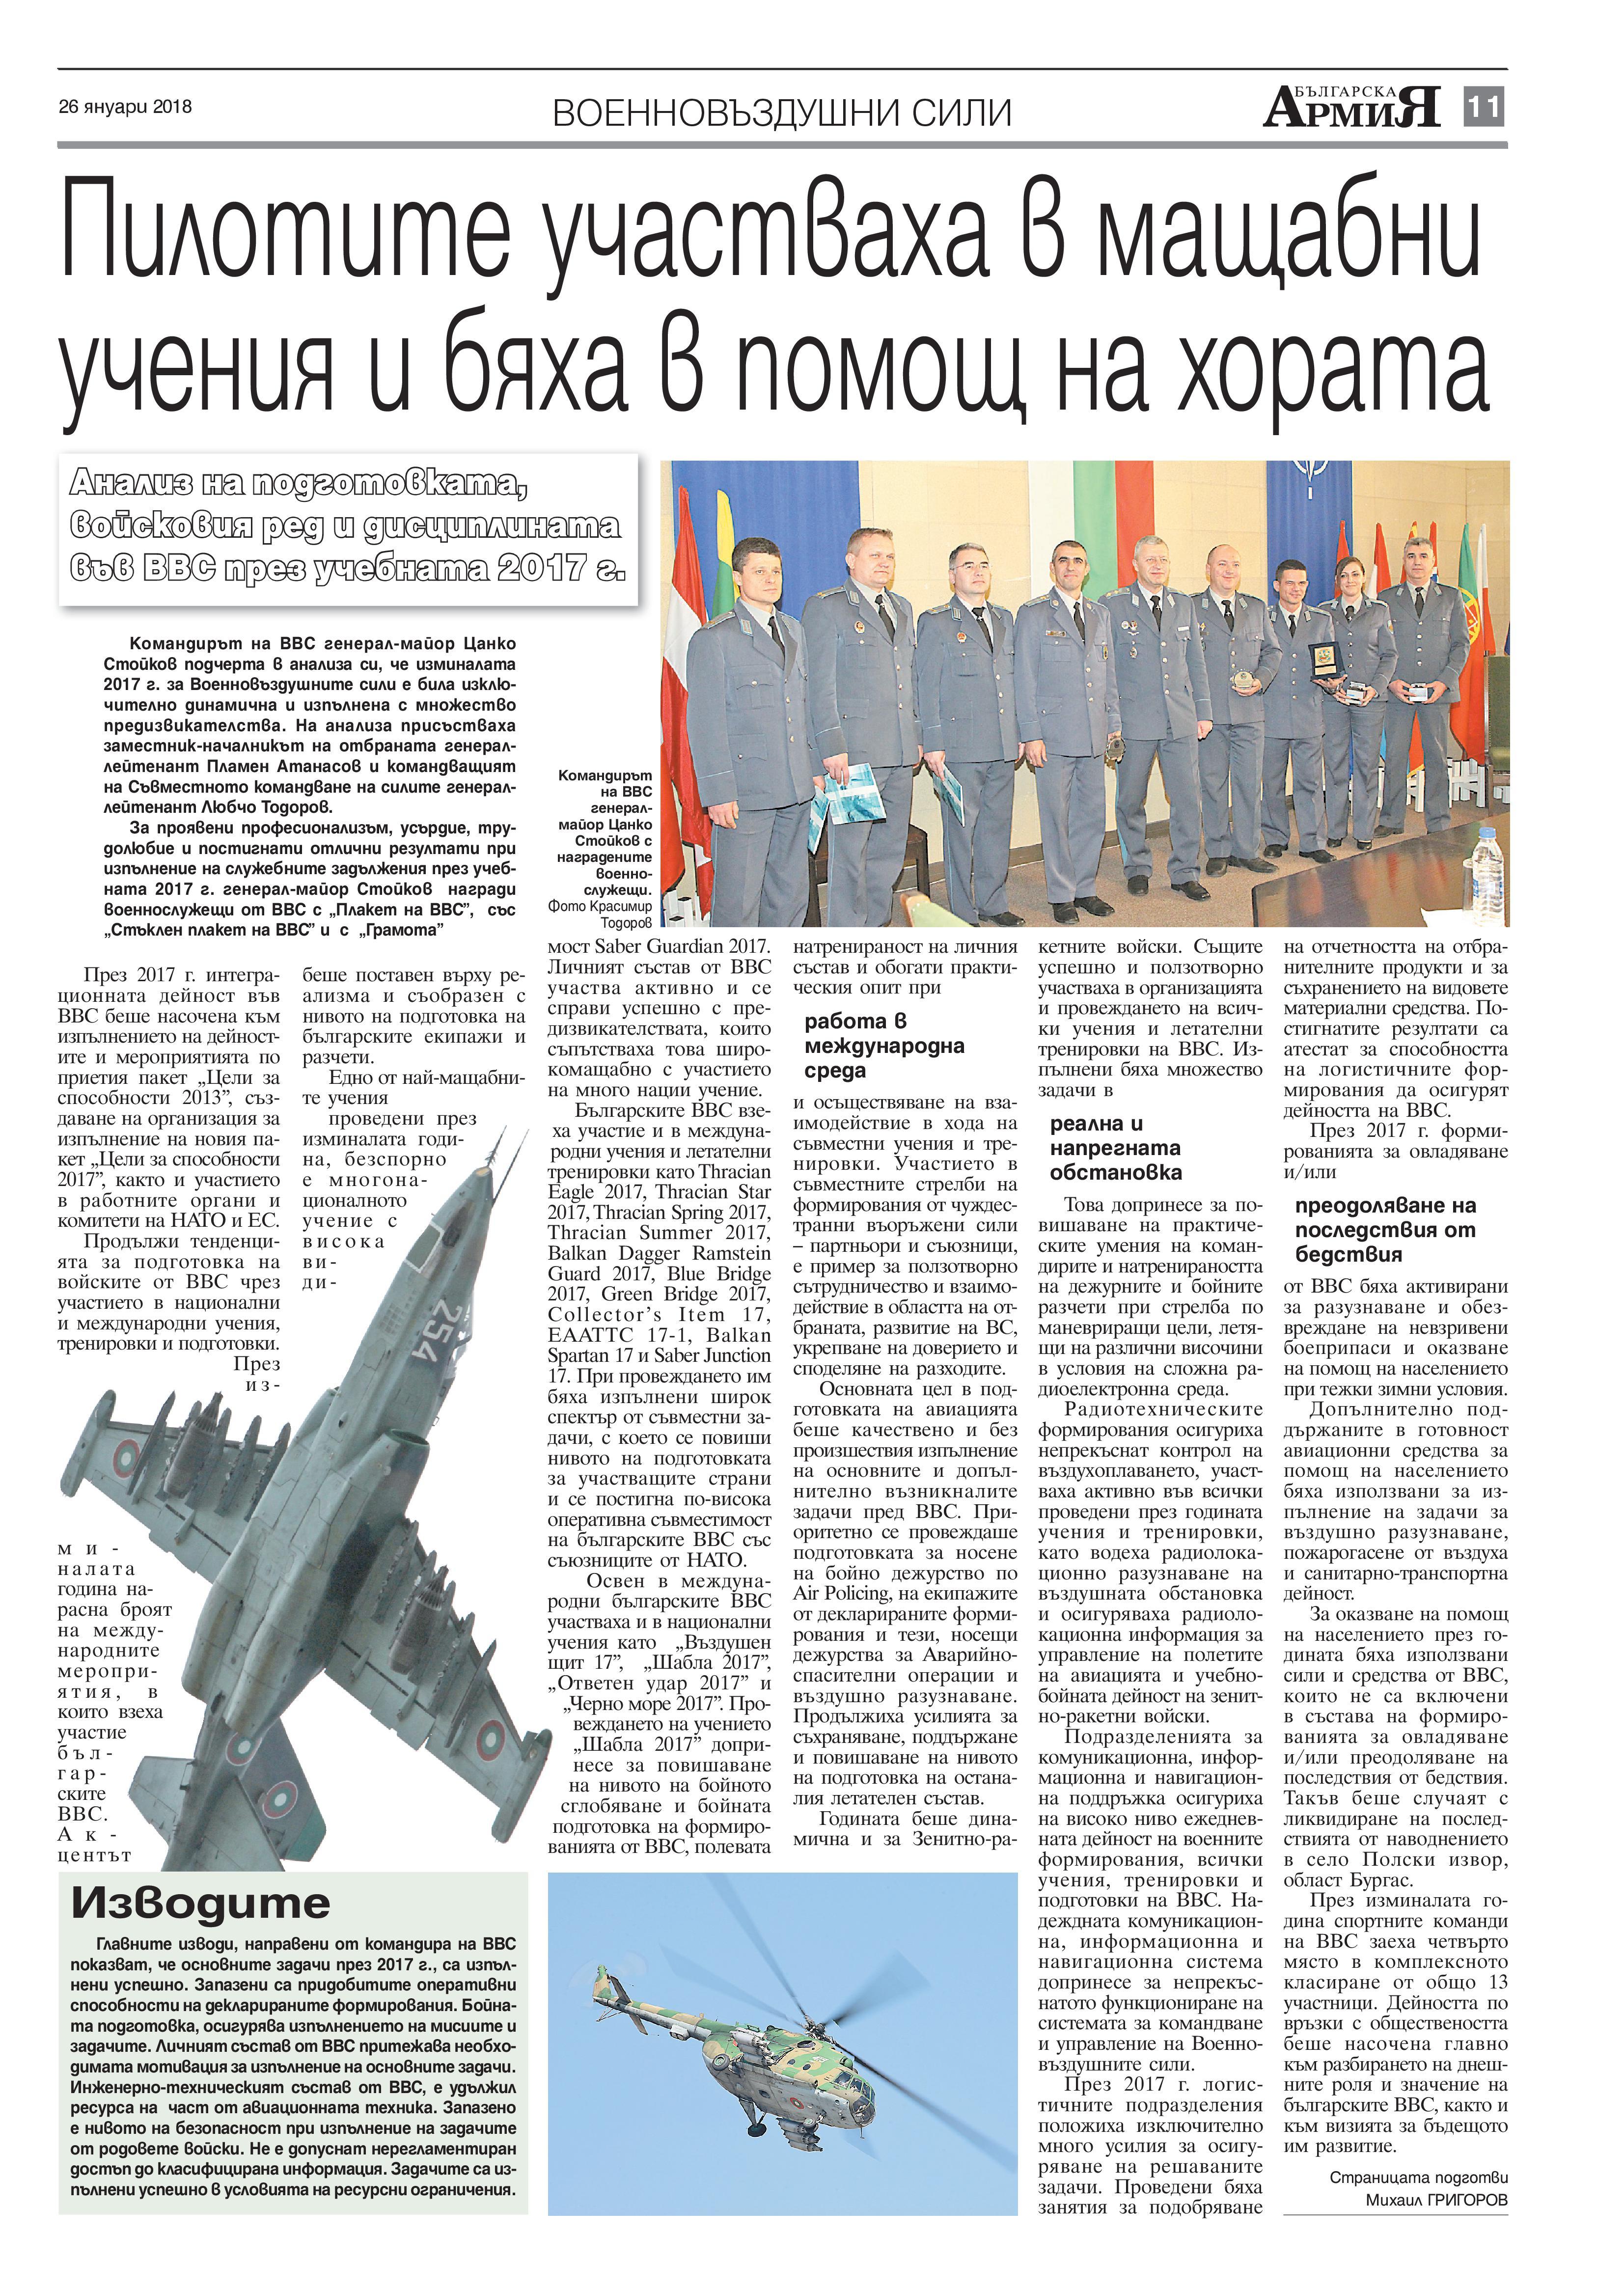 http://armymedia.bg/wp-content/uploads/2015/06/11-18.jpg